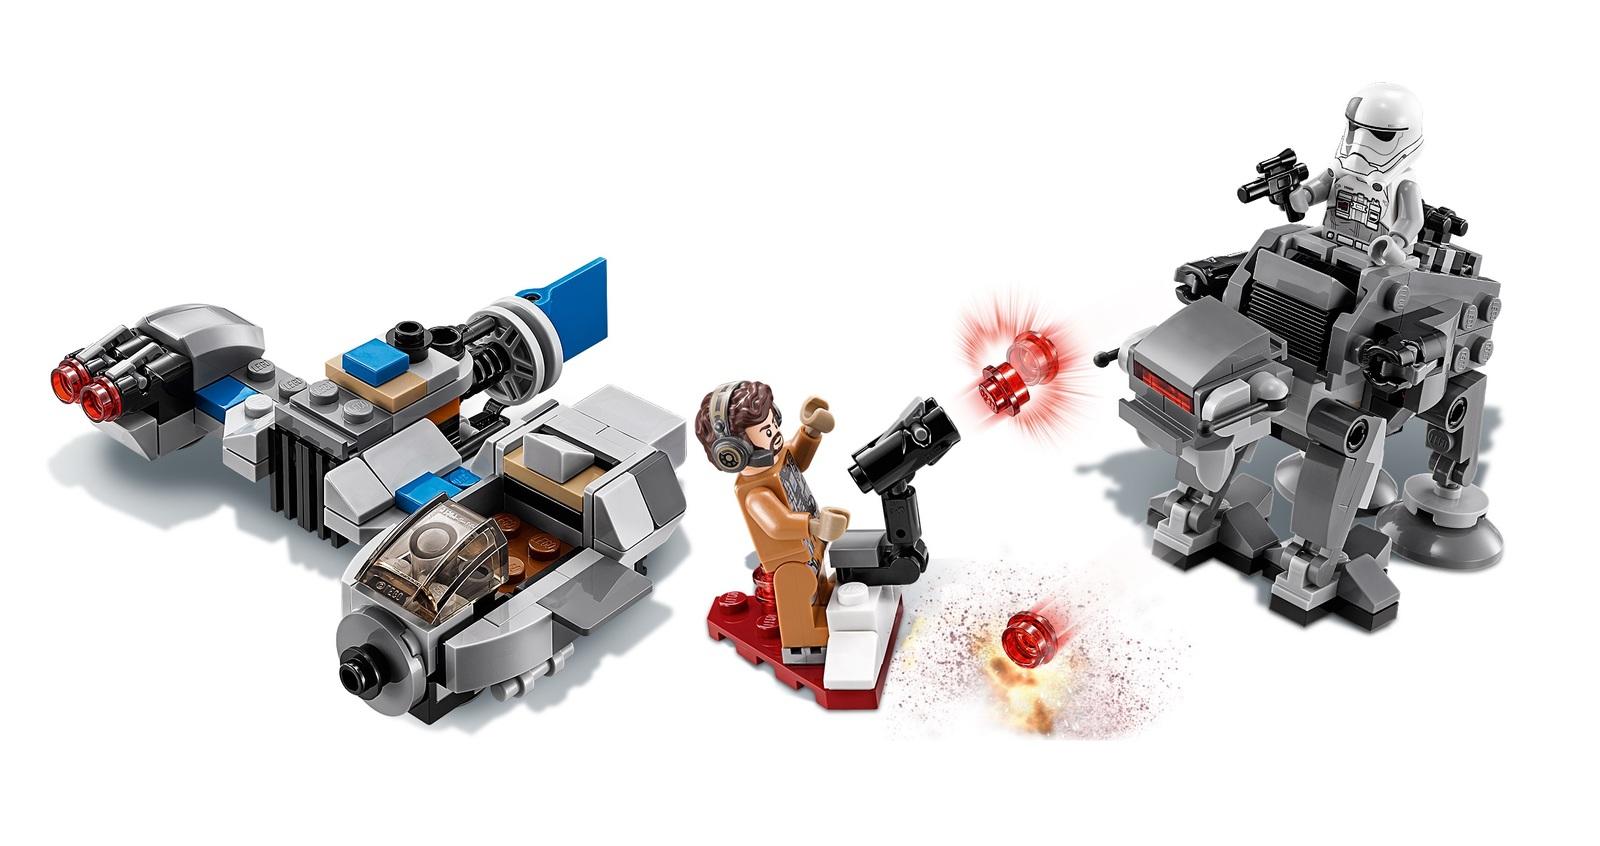 LEGO Star Wars: Ski Speeder vs. First Order Walker - Microfighters Set (75195) image